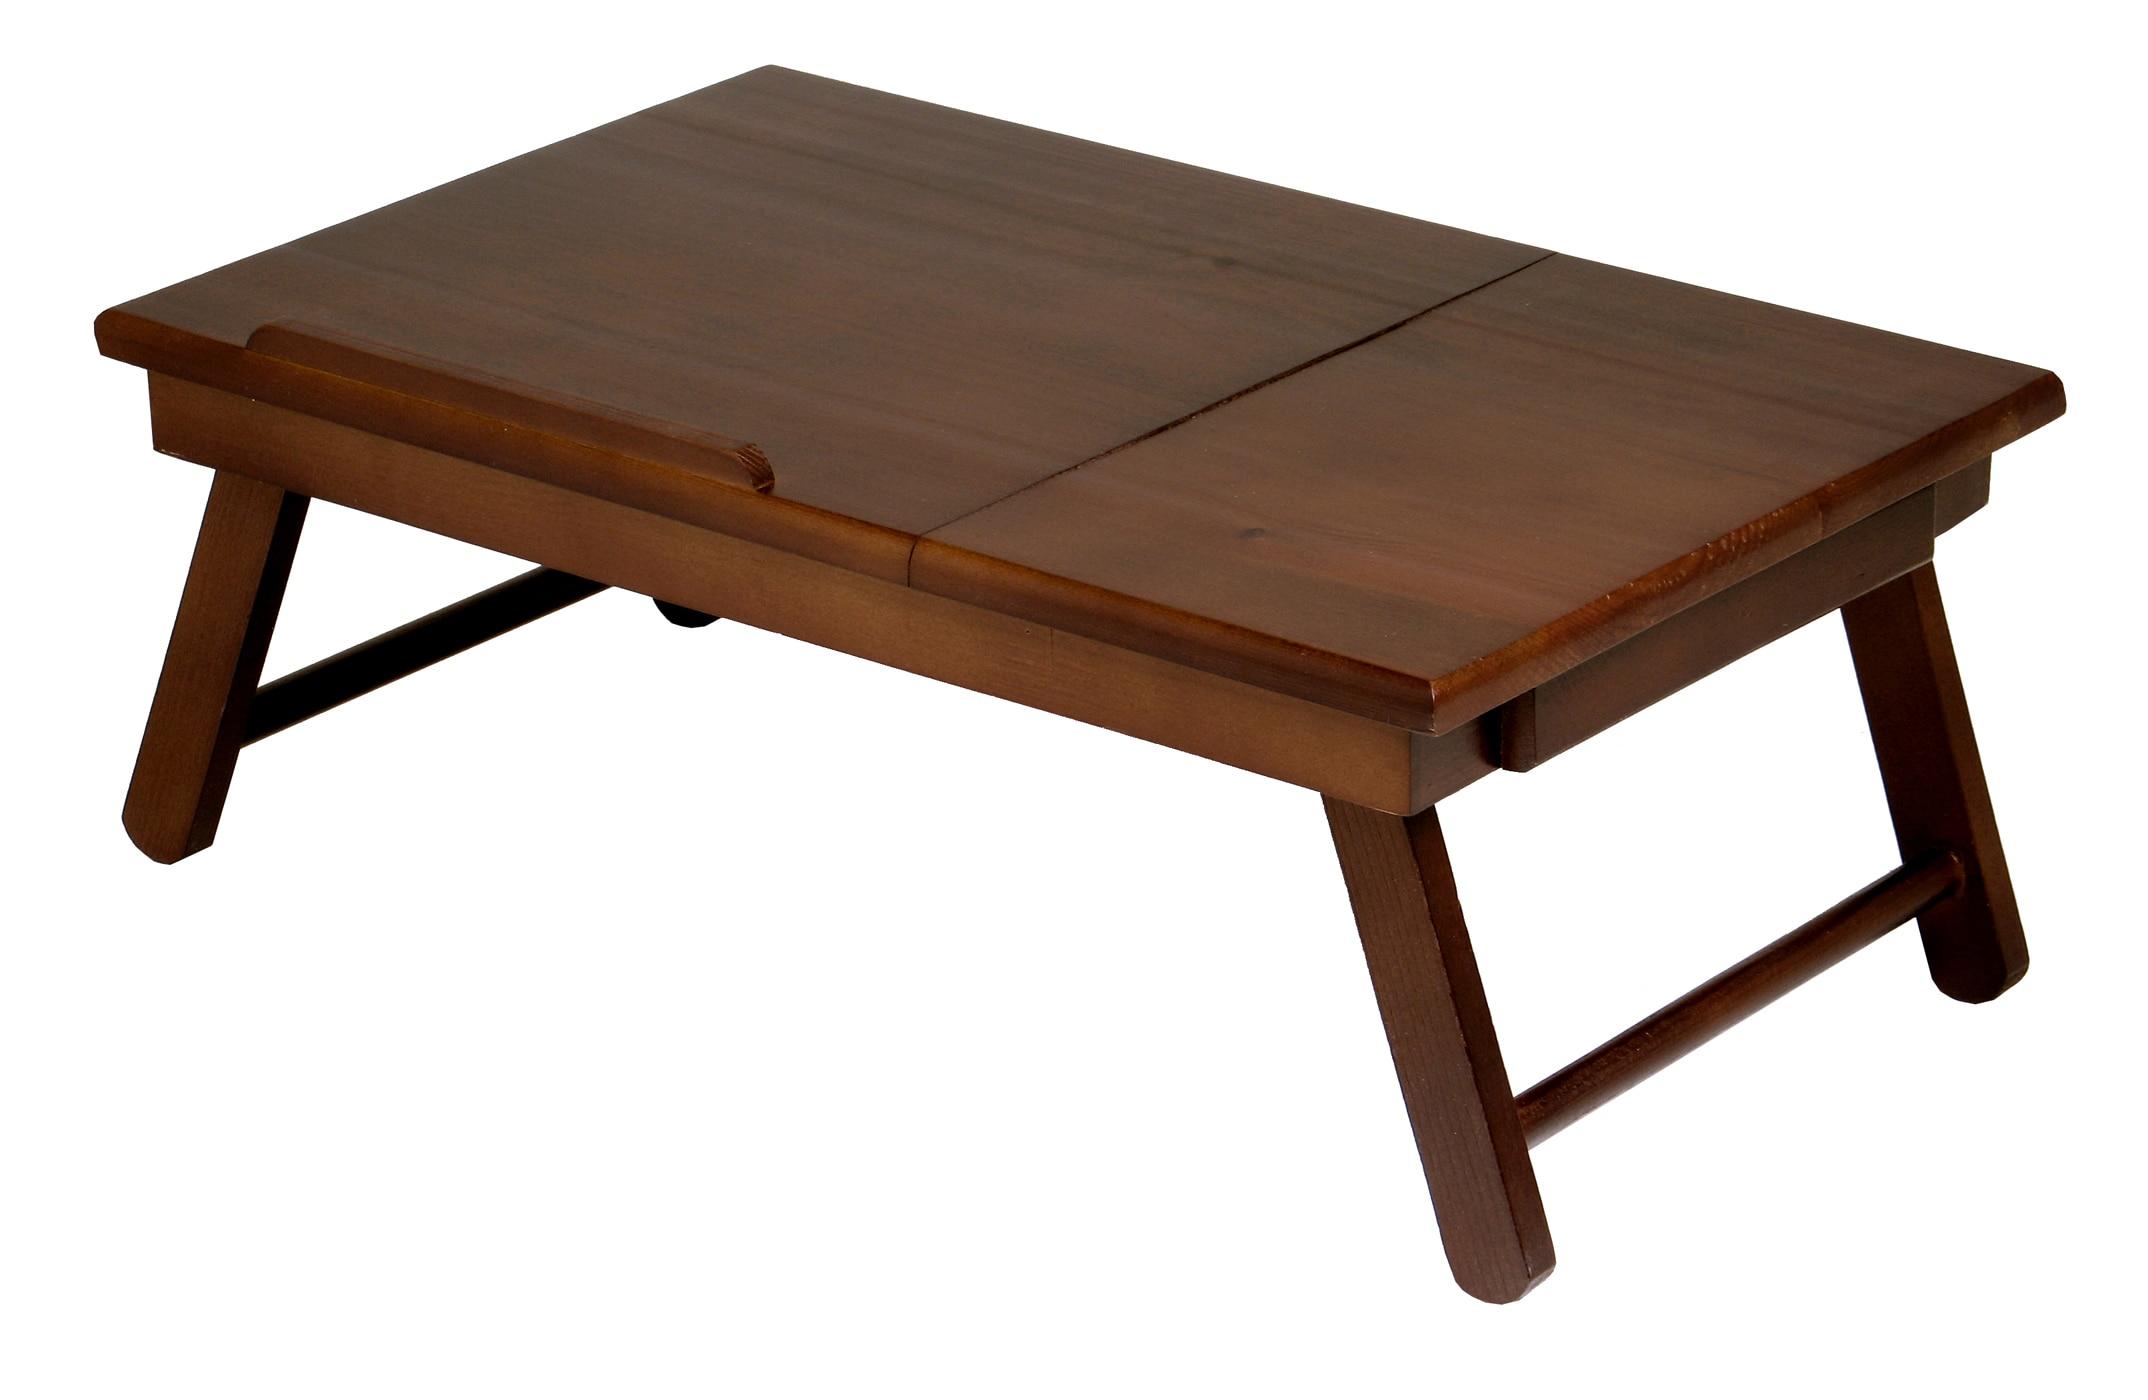 Alden Lap Desk - Flip Top with Drawer & Foldable Legs